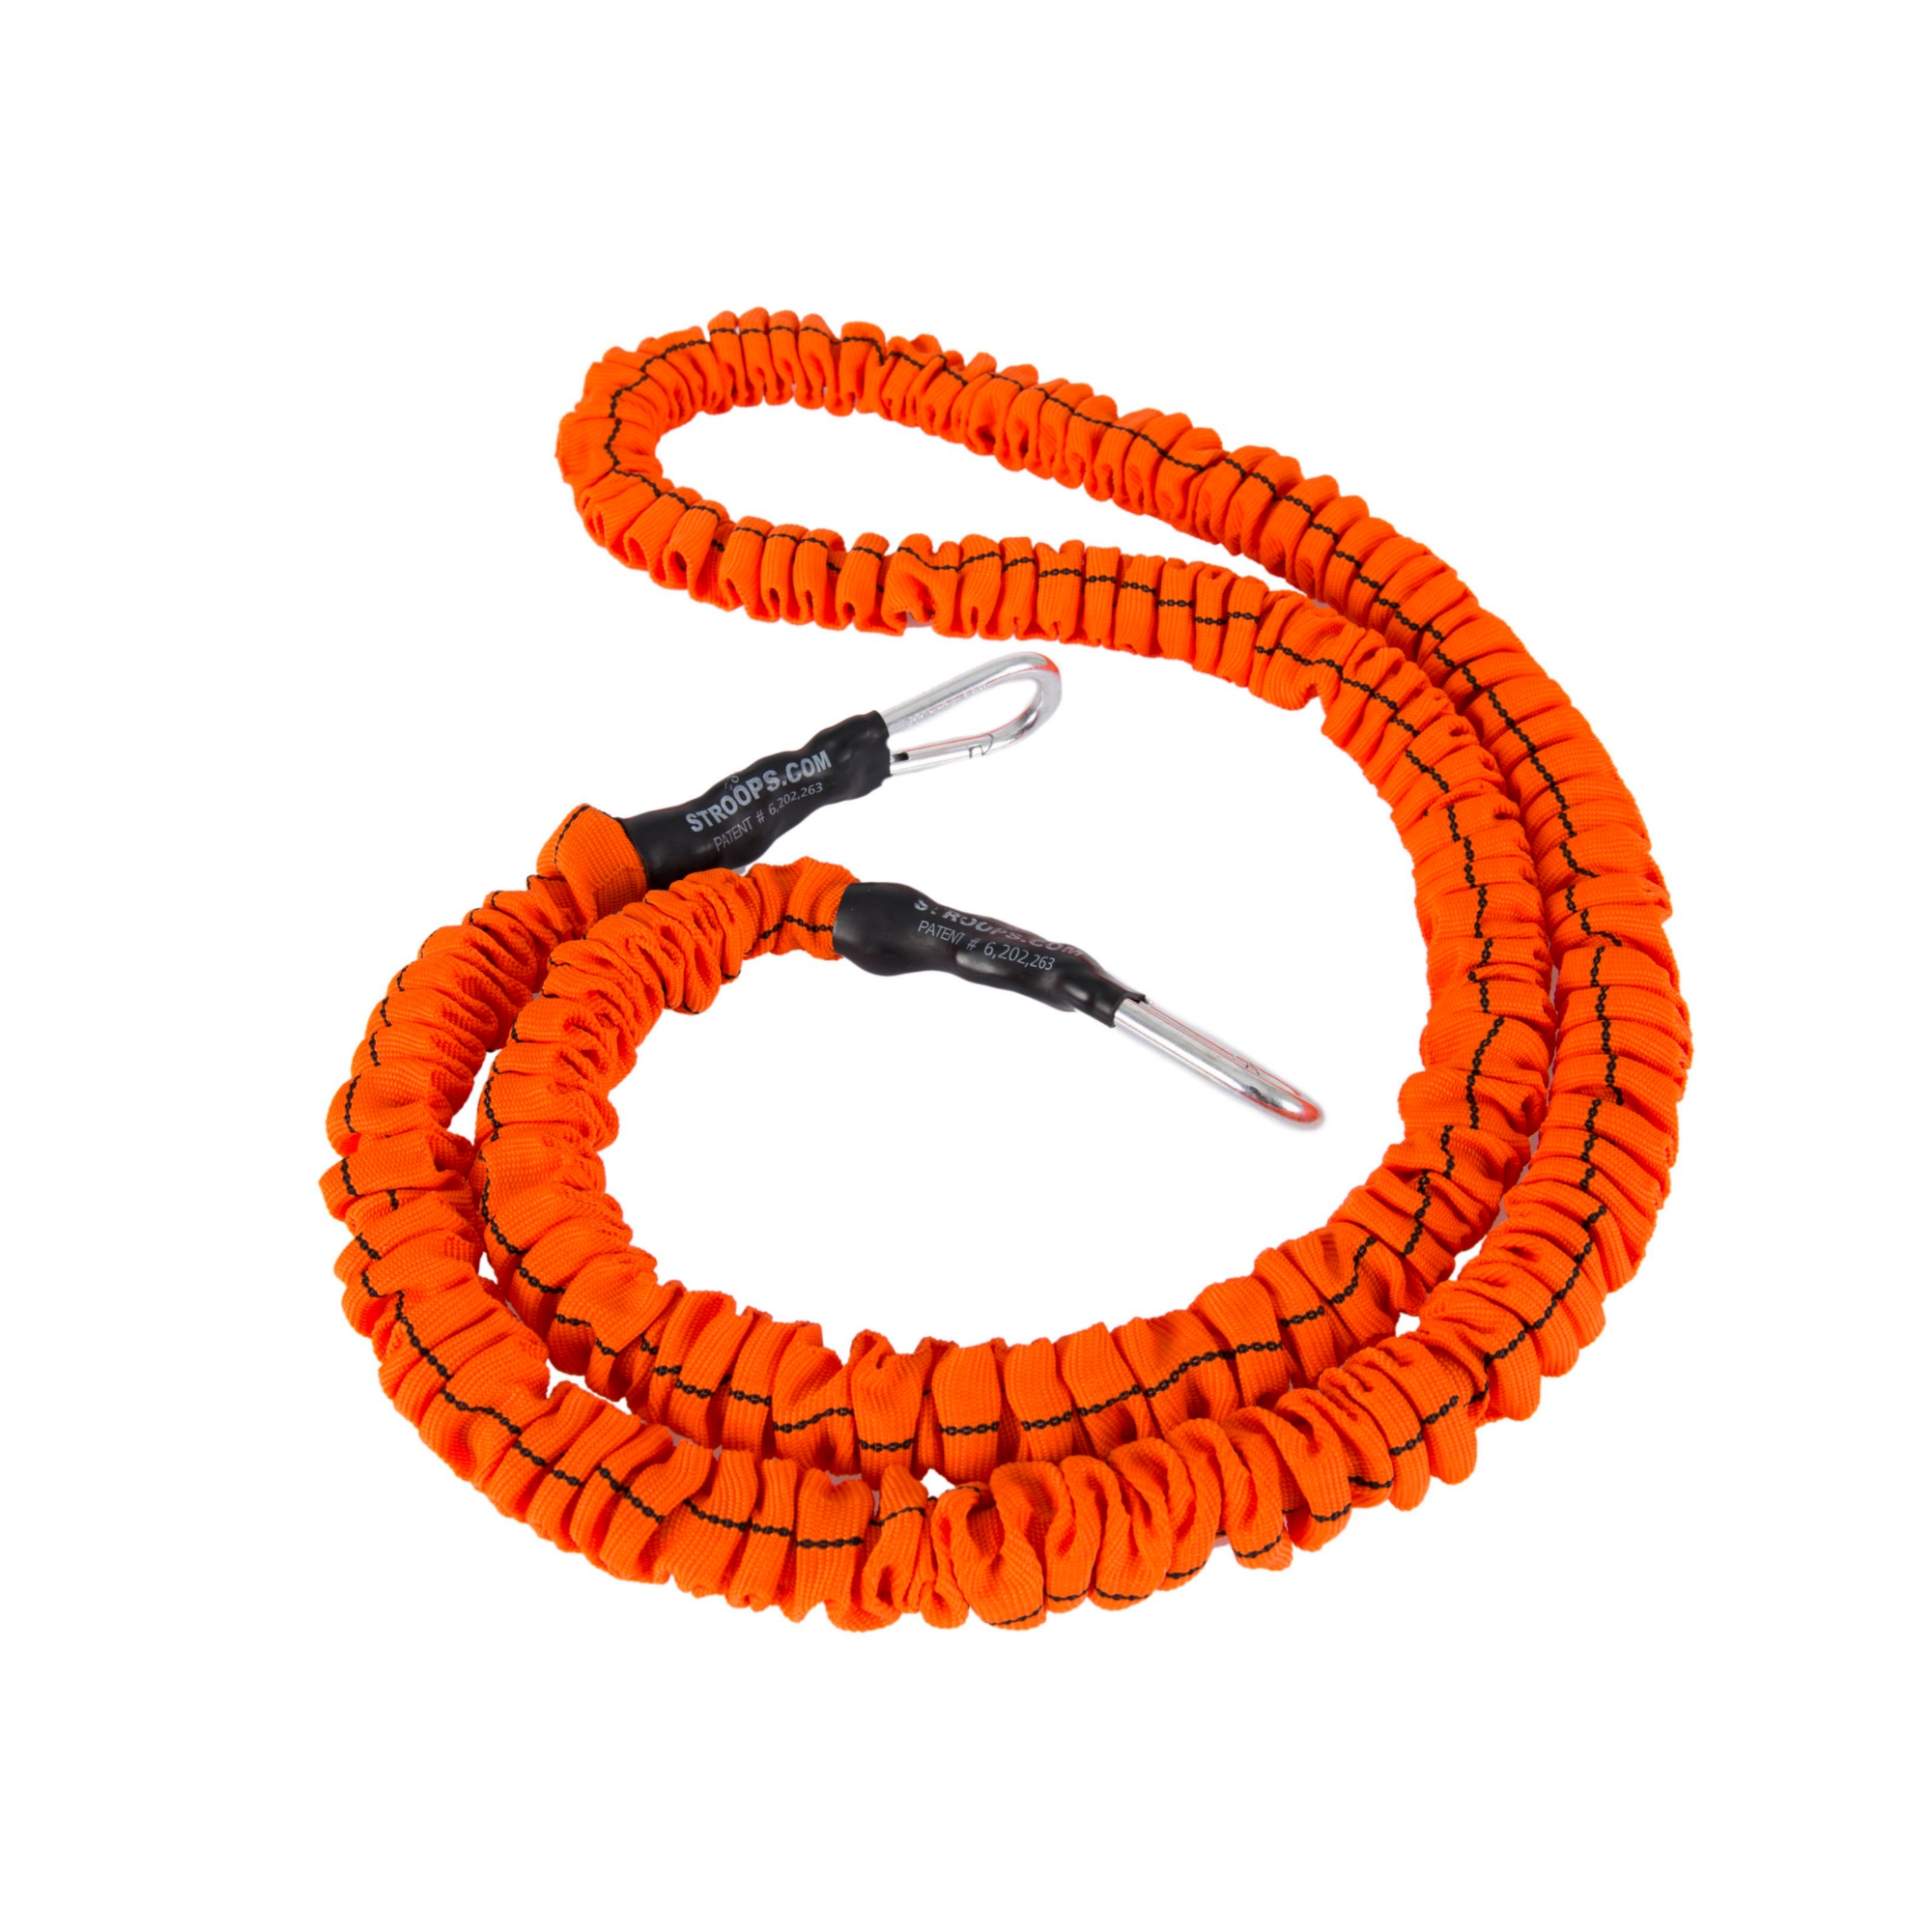 "Stroops 48"" Long Orange safety sleeve slastix w/clips Medium (Rot)"